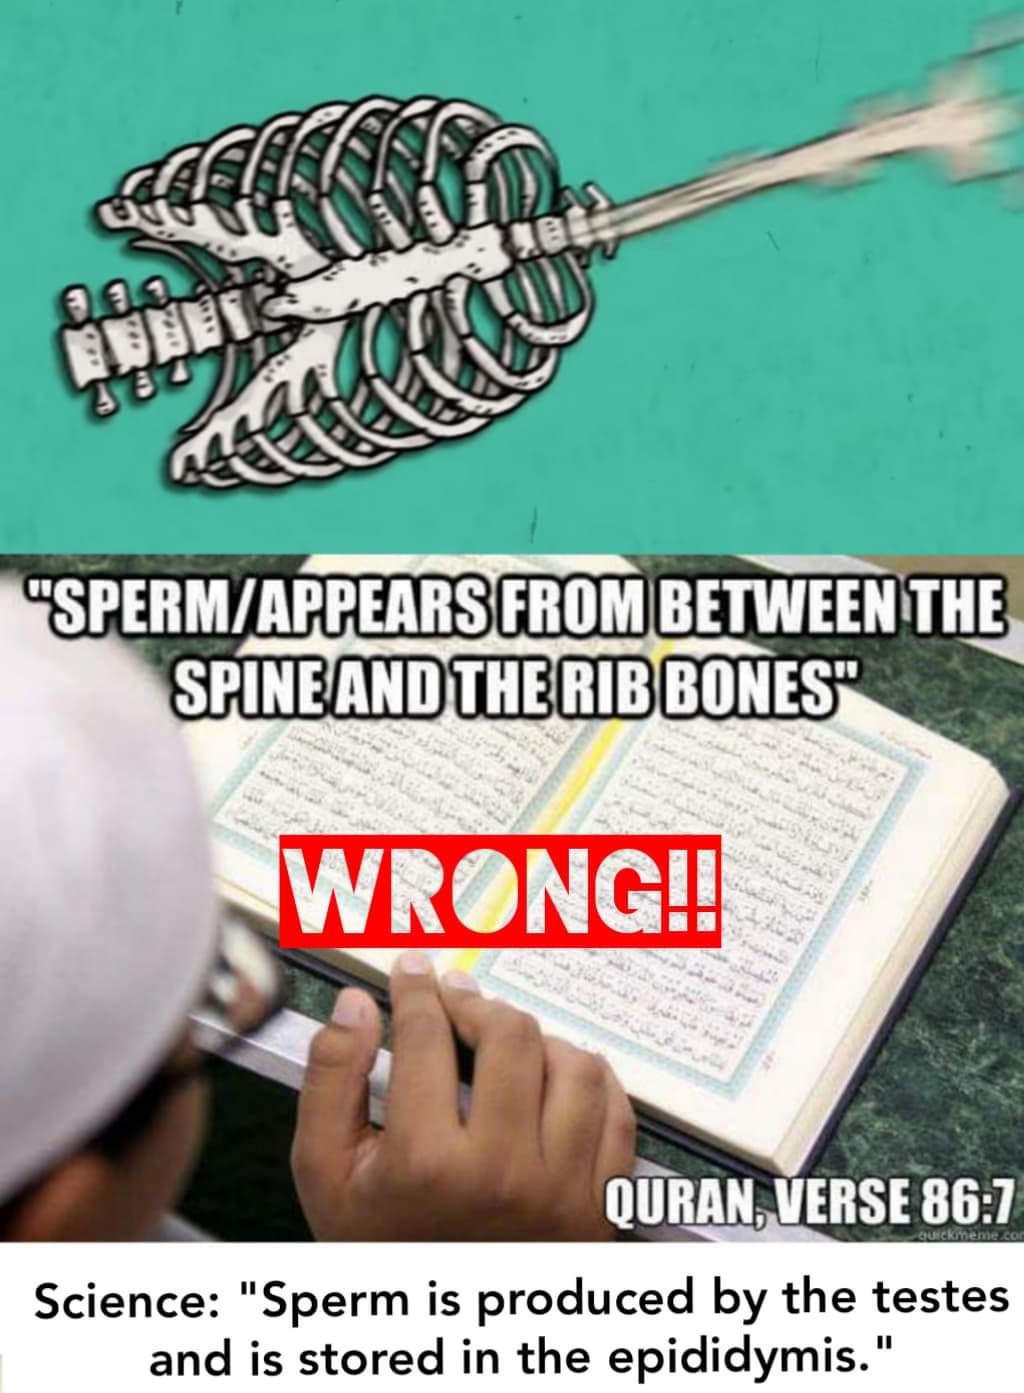 Scientific error quran source of sperm appears between spine and rib bones